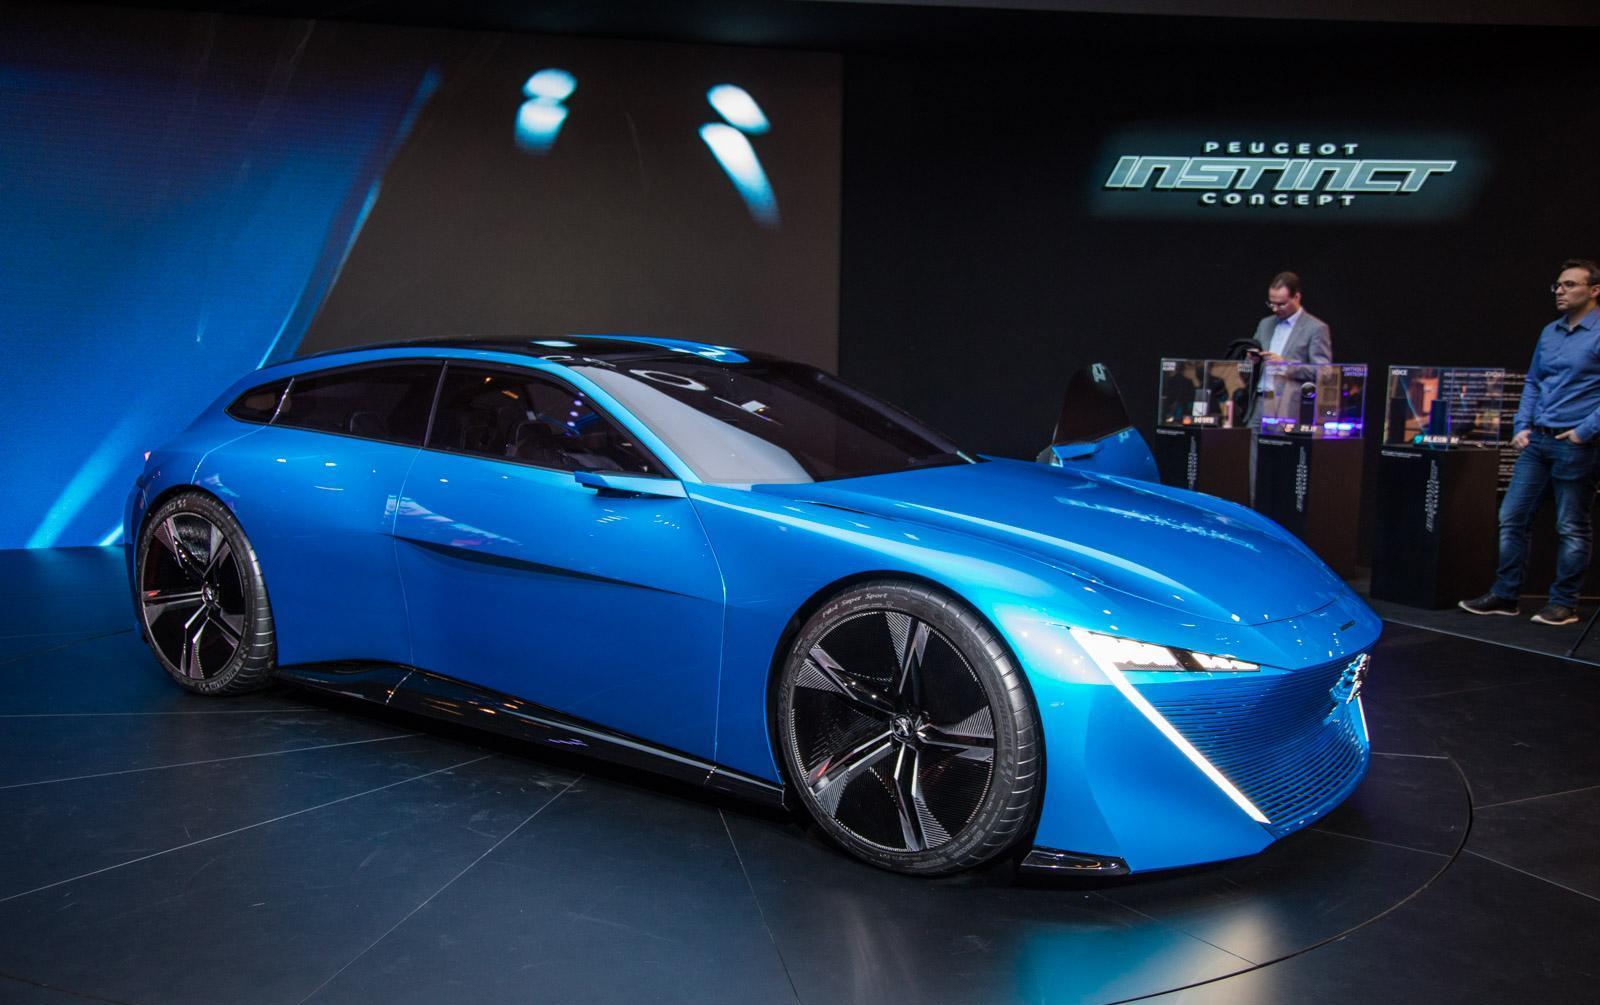 Peugeot-instinct-concept-024